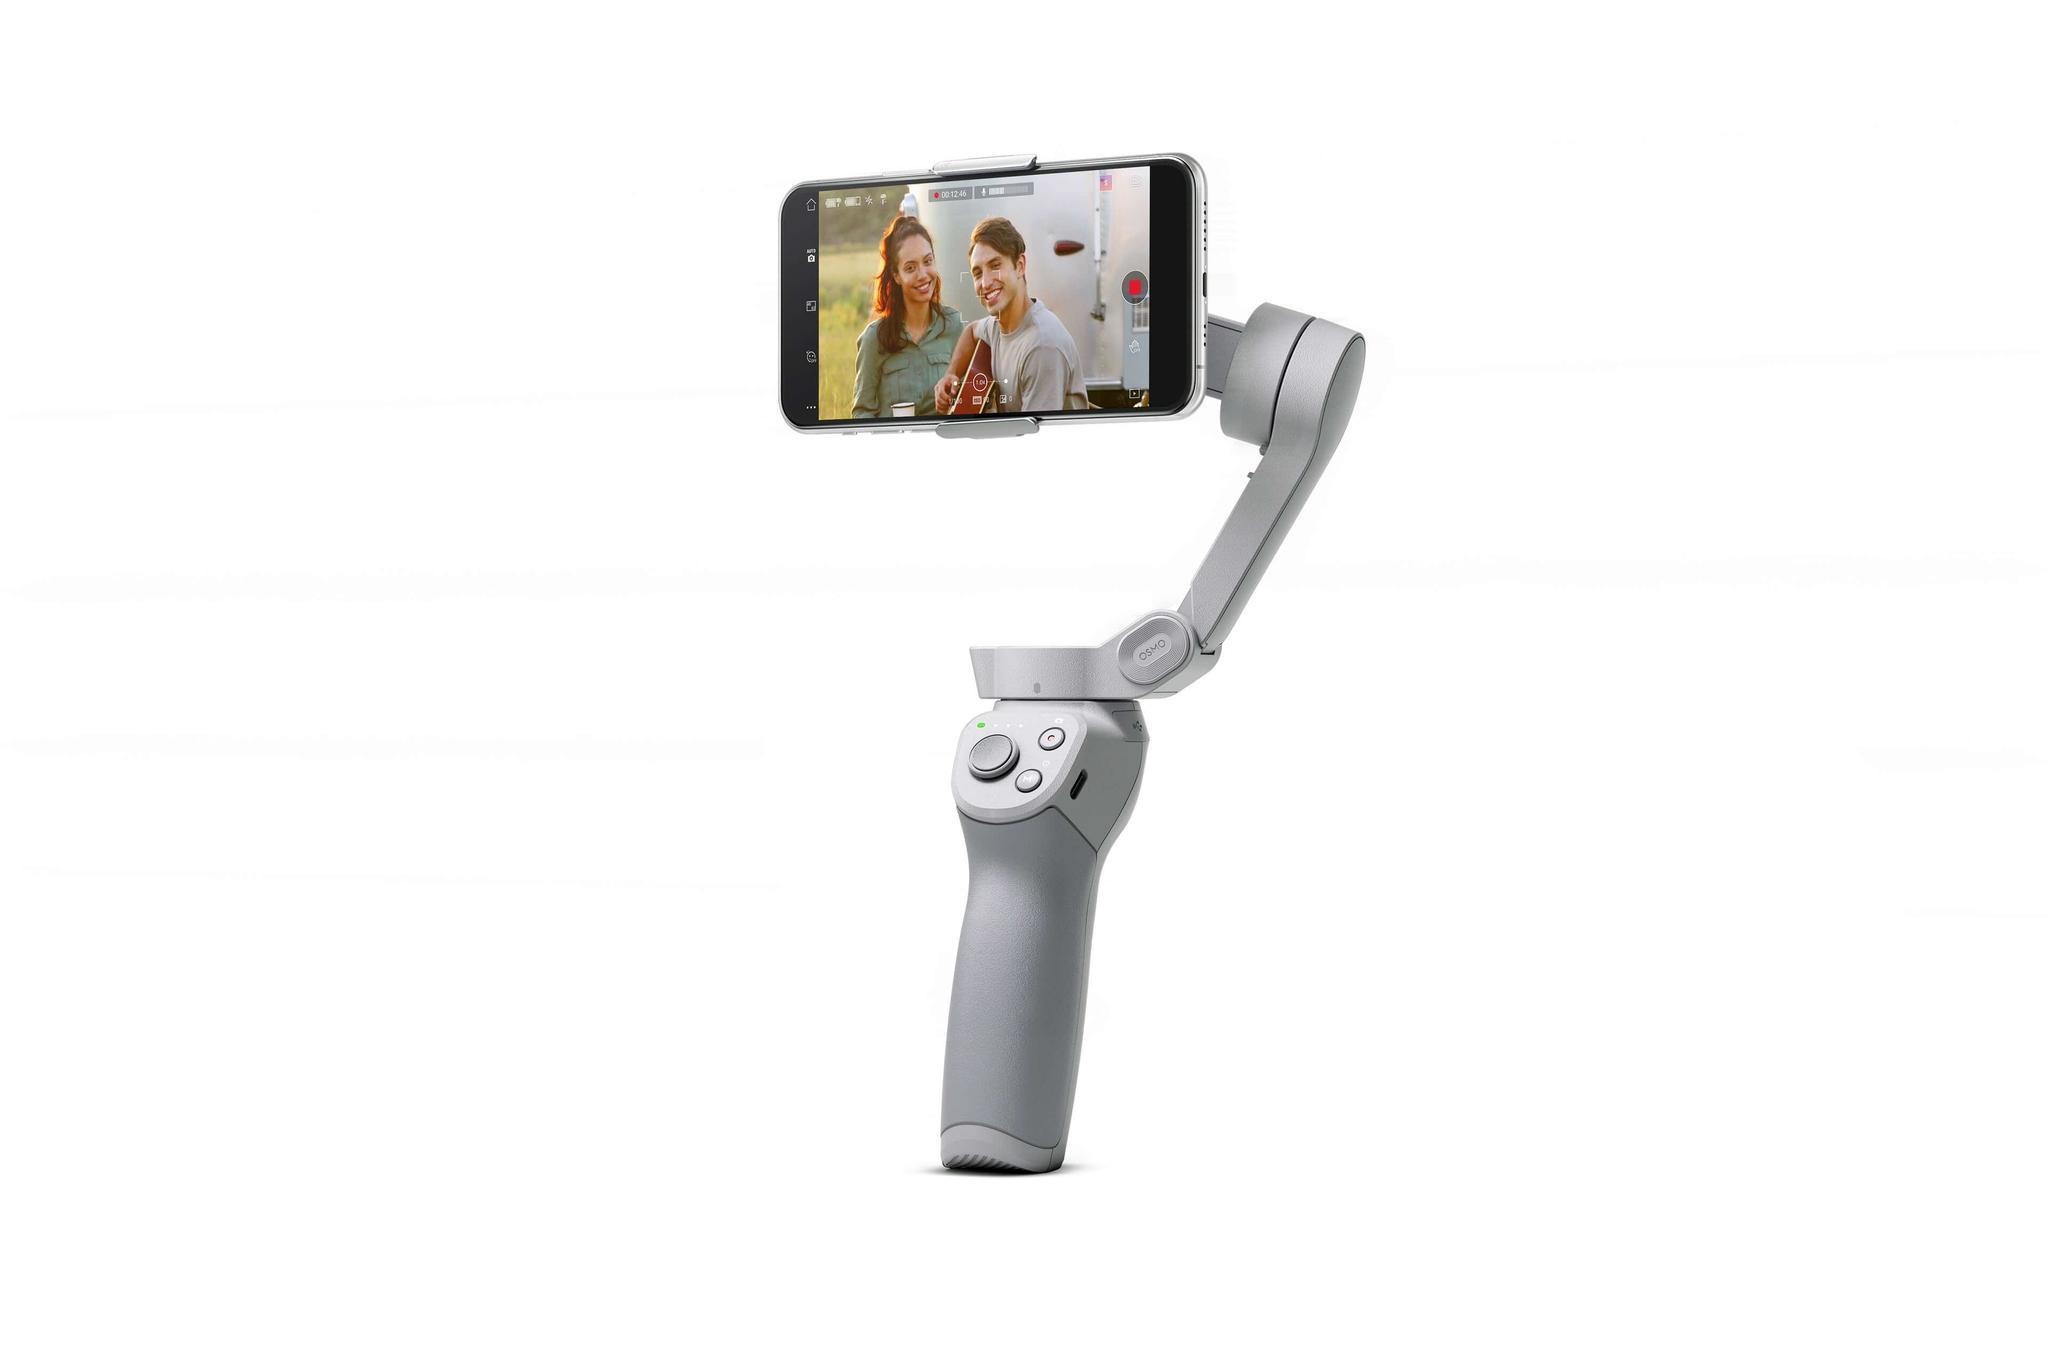 DJI Osmo Монопод-стабилизатор для селфи DJI Osmo Mobile 4 99f1d21b00a2a38cb6038d925256e87e.jpg